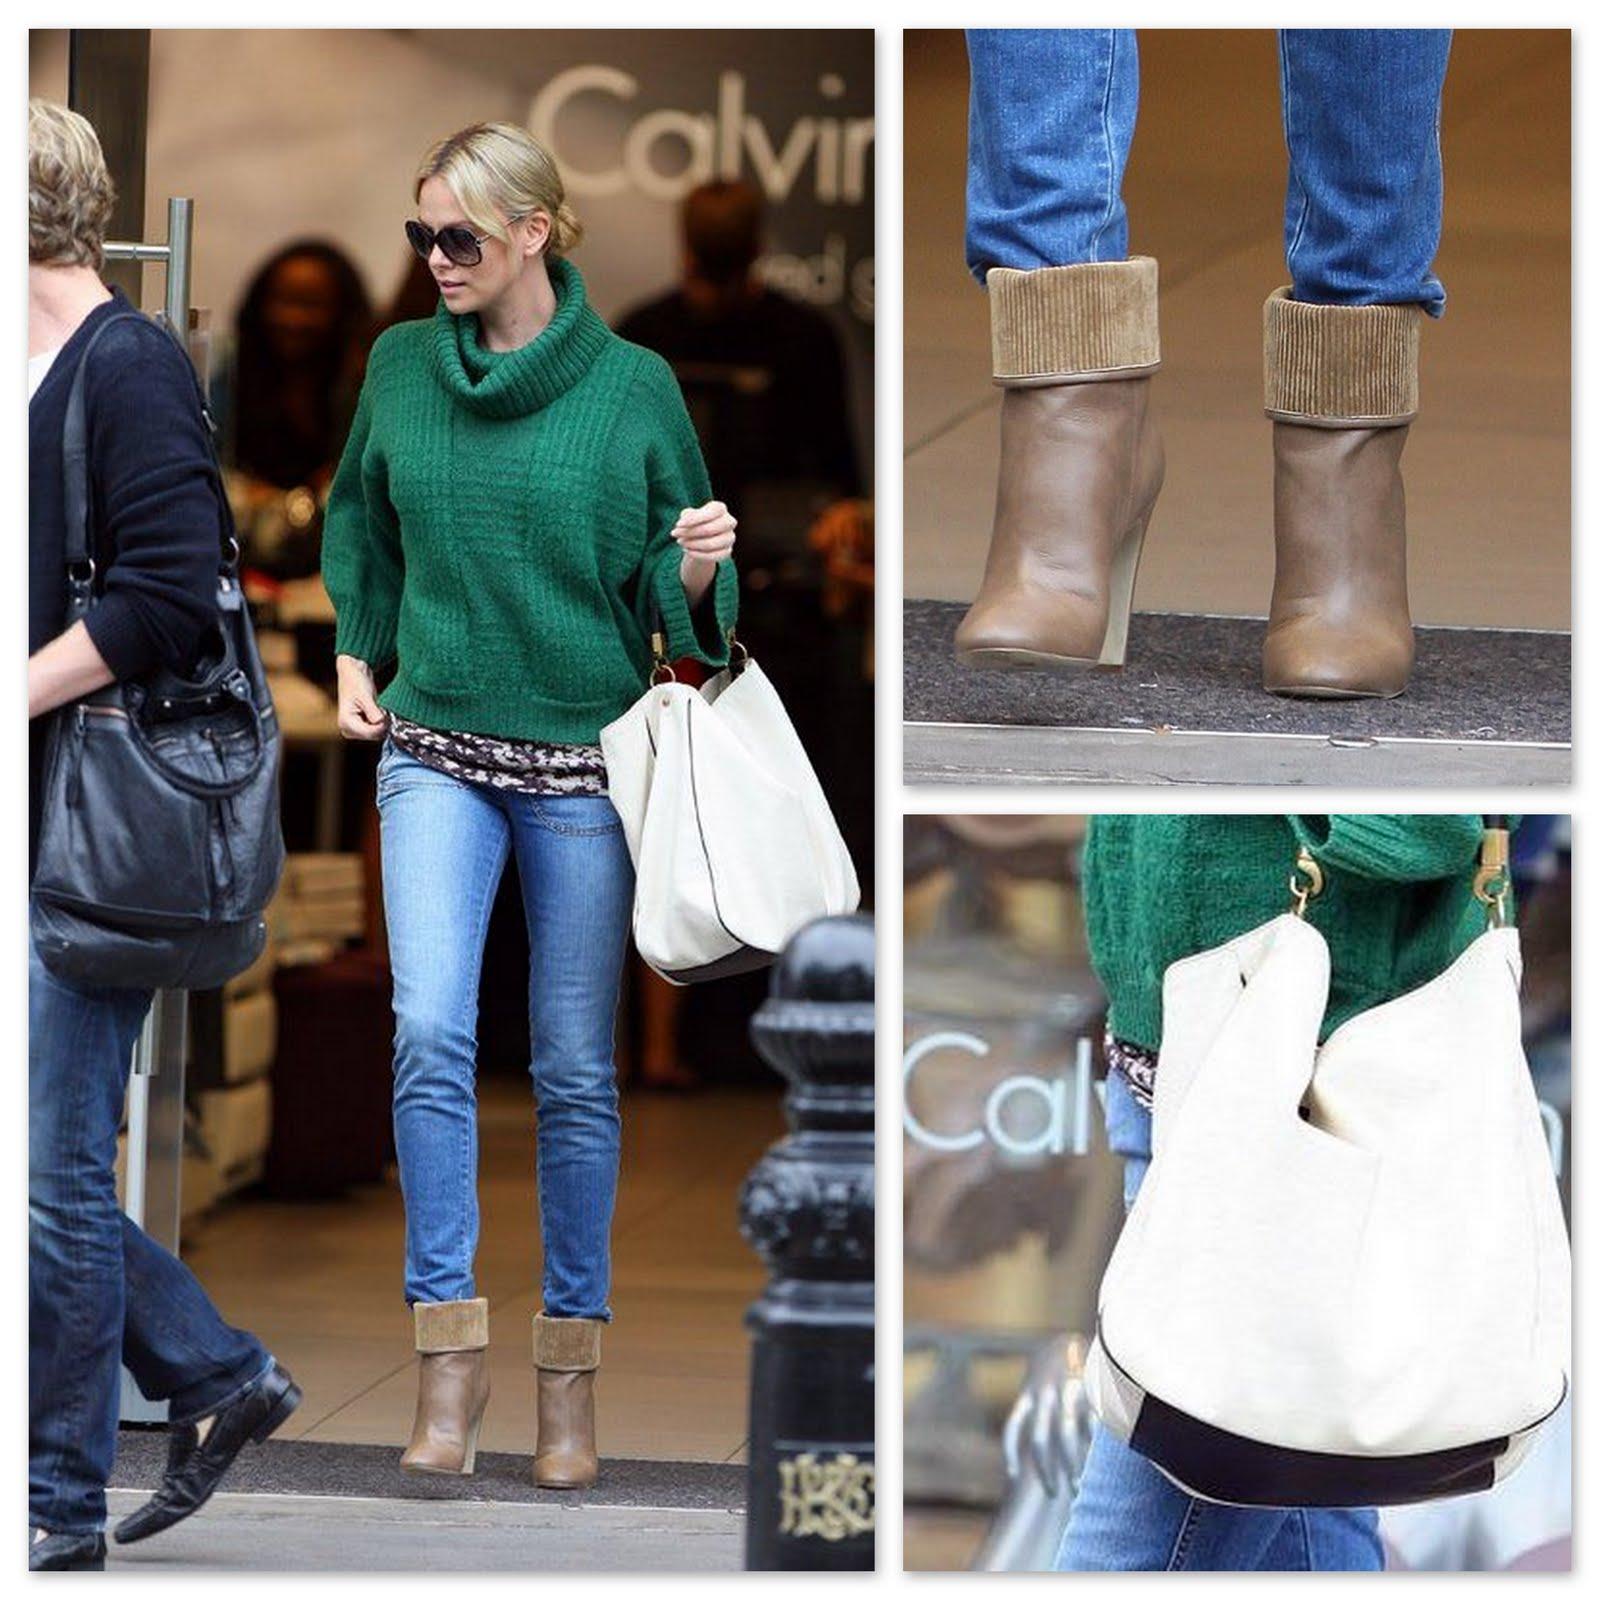 http://1.bp.blogspot.com/-KcYv4uDJwdk/TmL6995MxMI/AAAAAAAAFPo/0kK7Ia4J7a8/s1600/best+dressed1.jpg